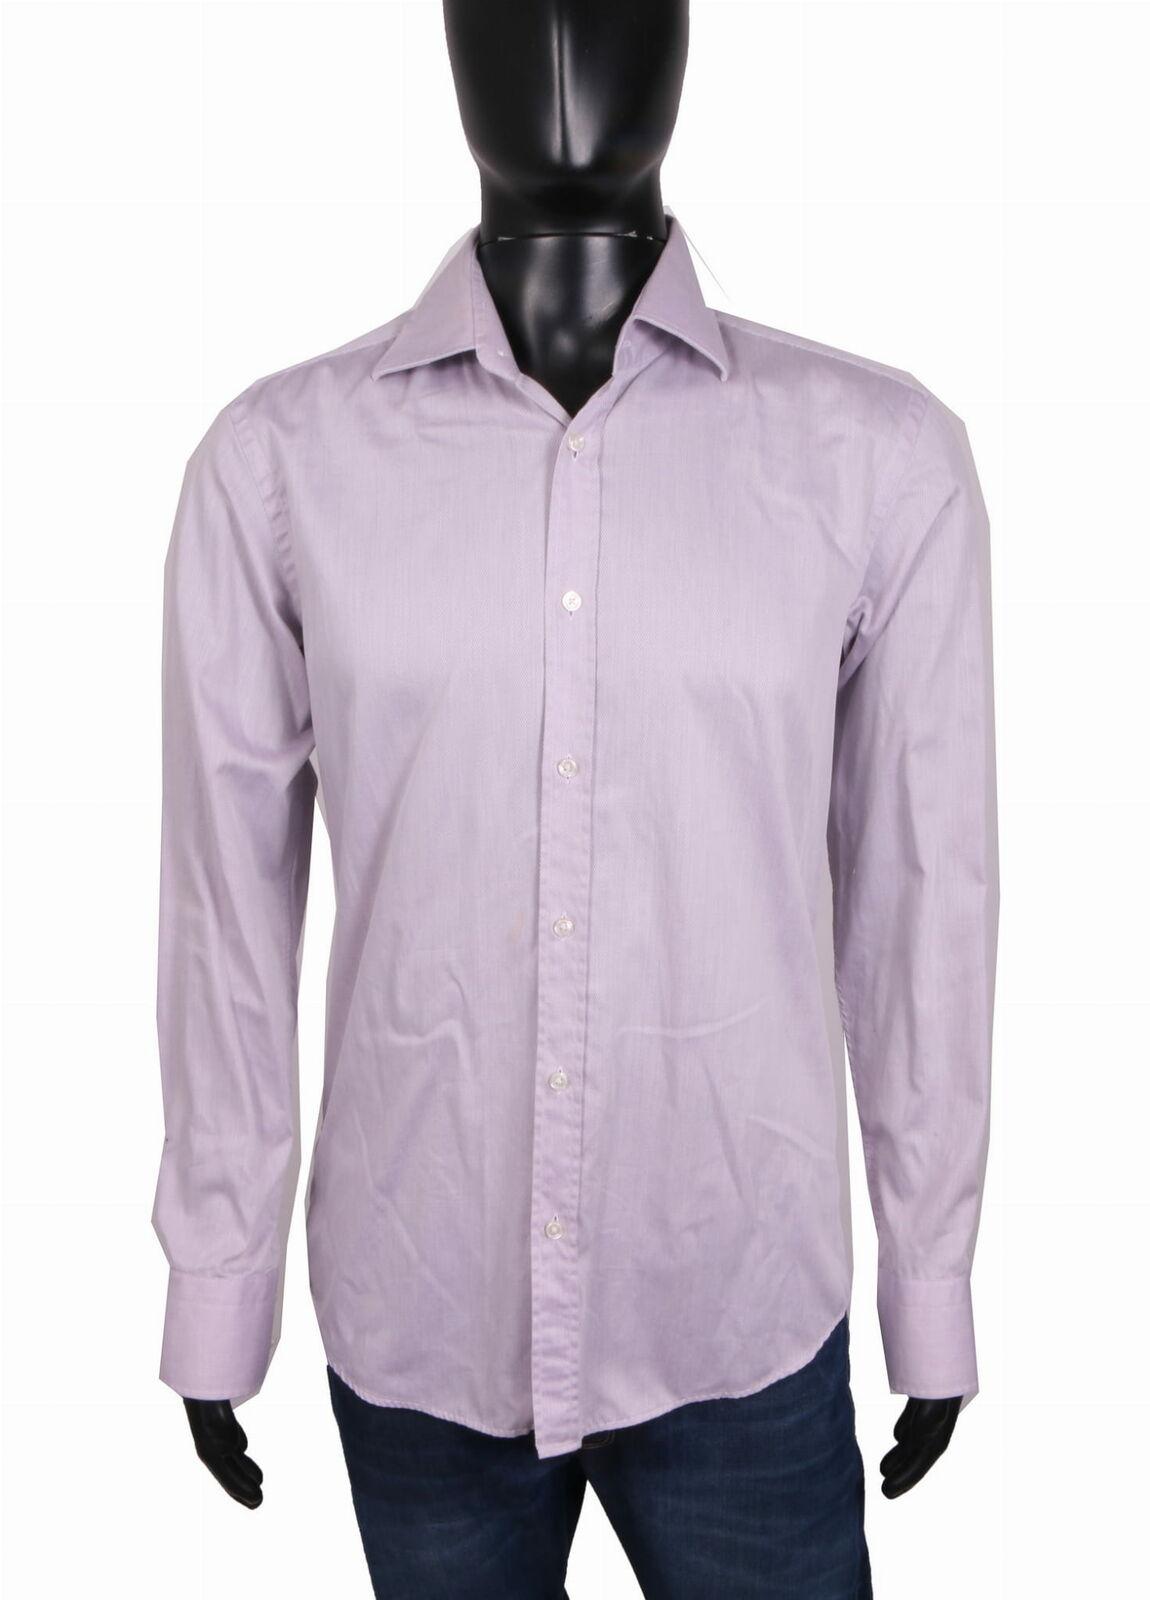 46ab232c Boss Shirt Tailored Cotton size 40 Hugo Mens nvdudq3215-Casual ...